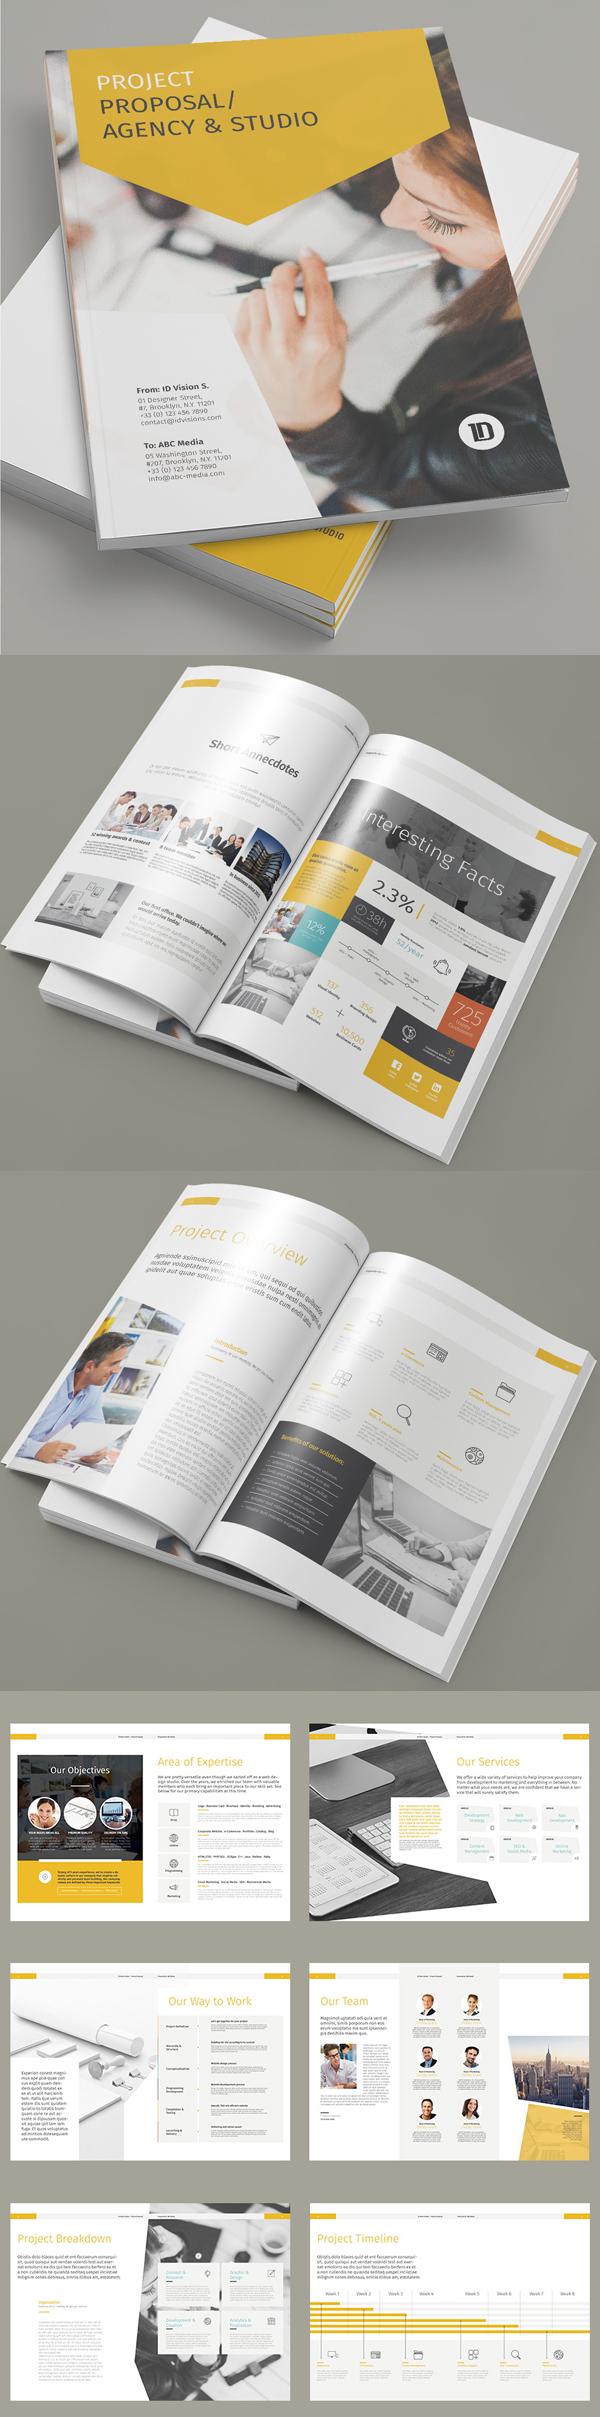 100 Professional Corporate Brochure Templates - 13